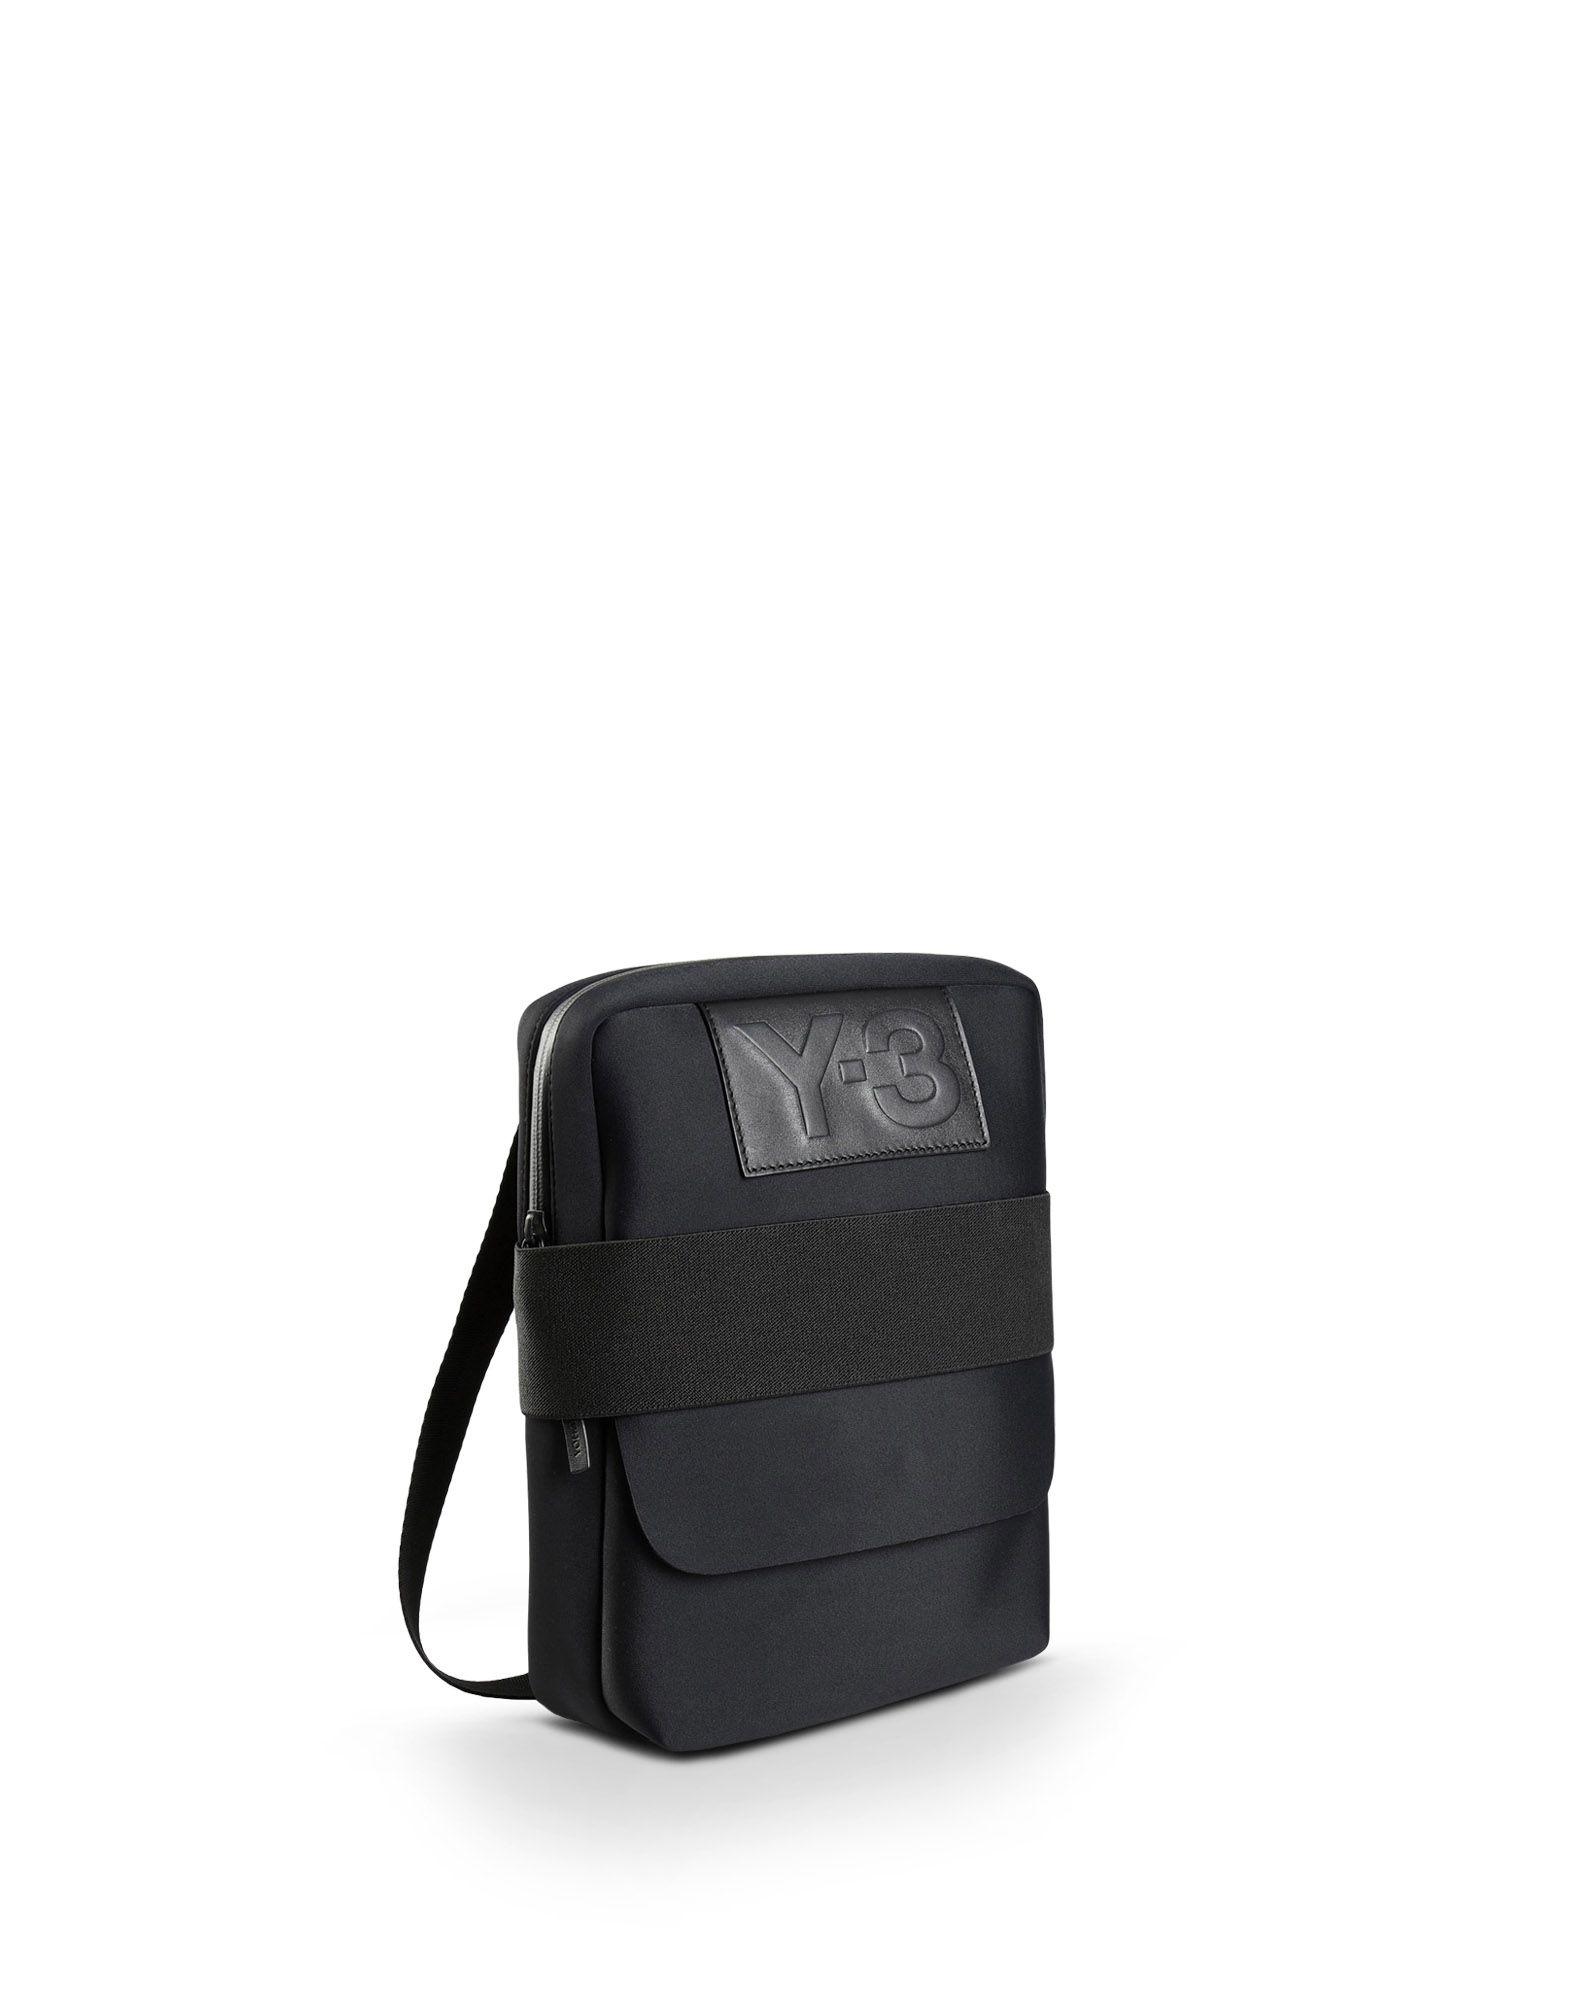 91fd4000607 Y 3 QASA PORTER BAG Shoulder Bags   Adidas Y-3 Official ...